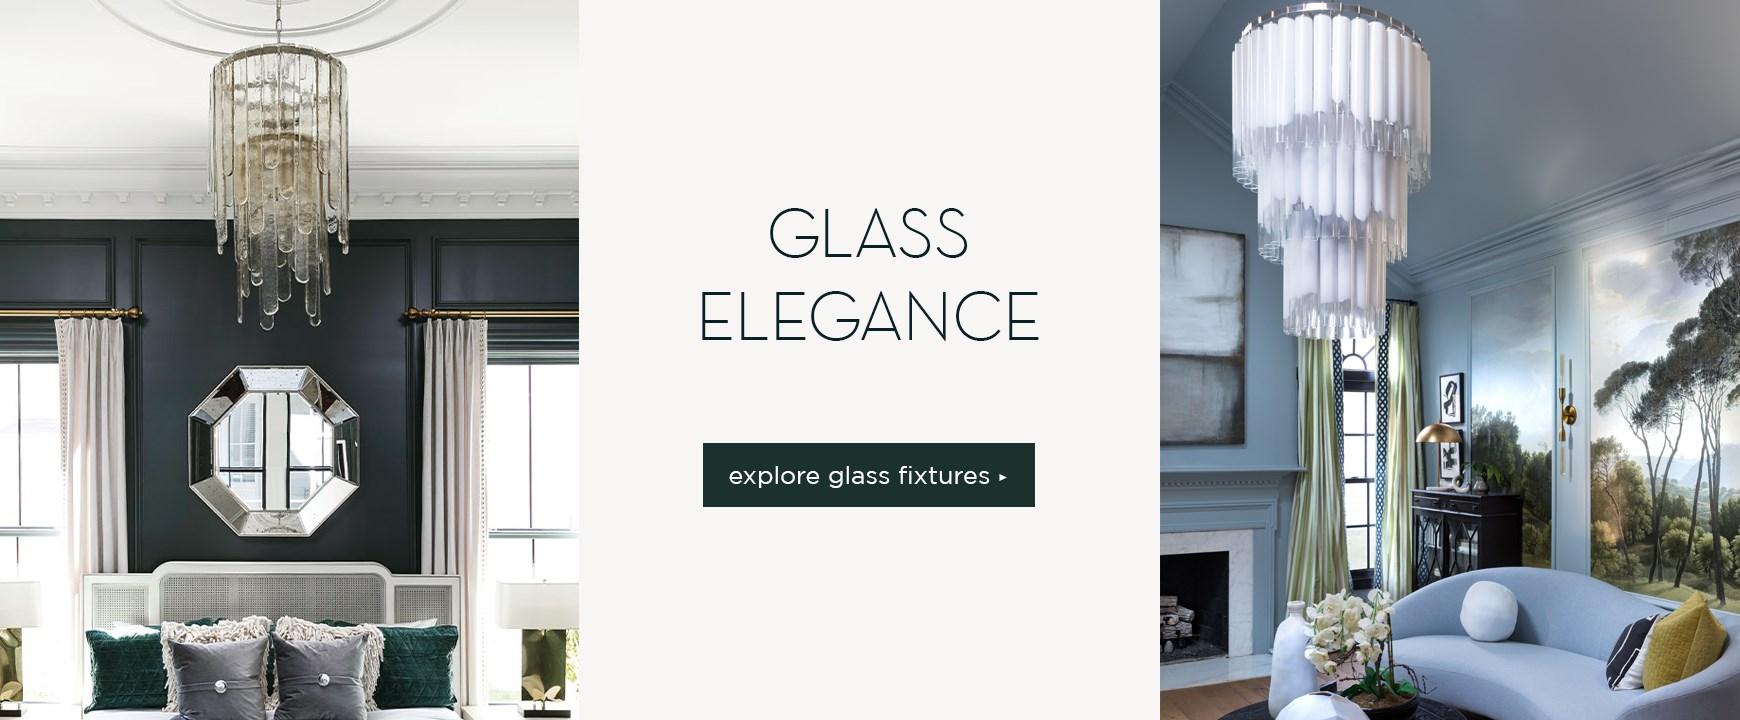 Explore Glass Fixtures